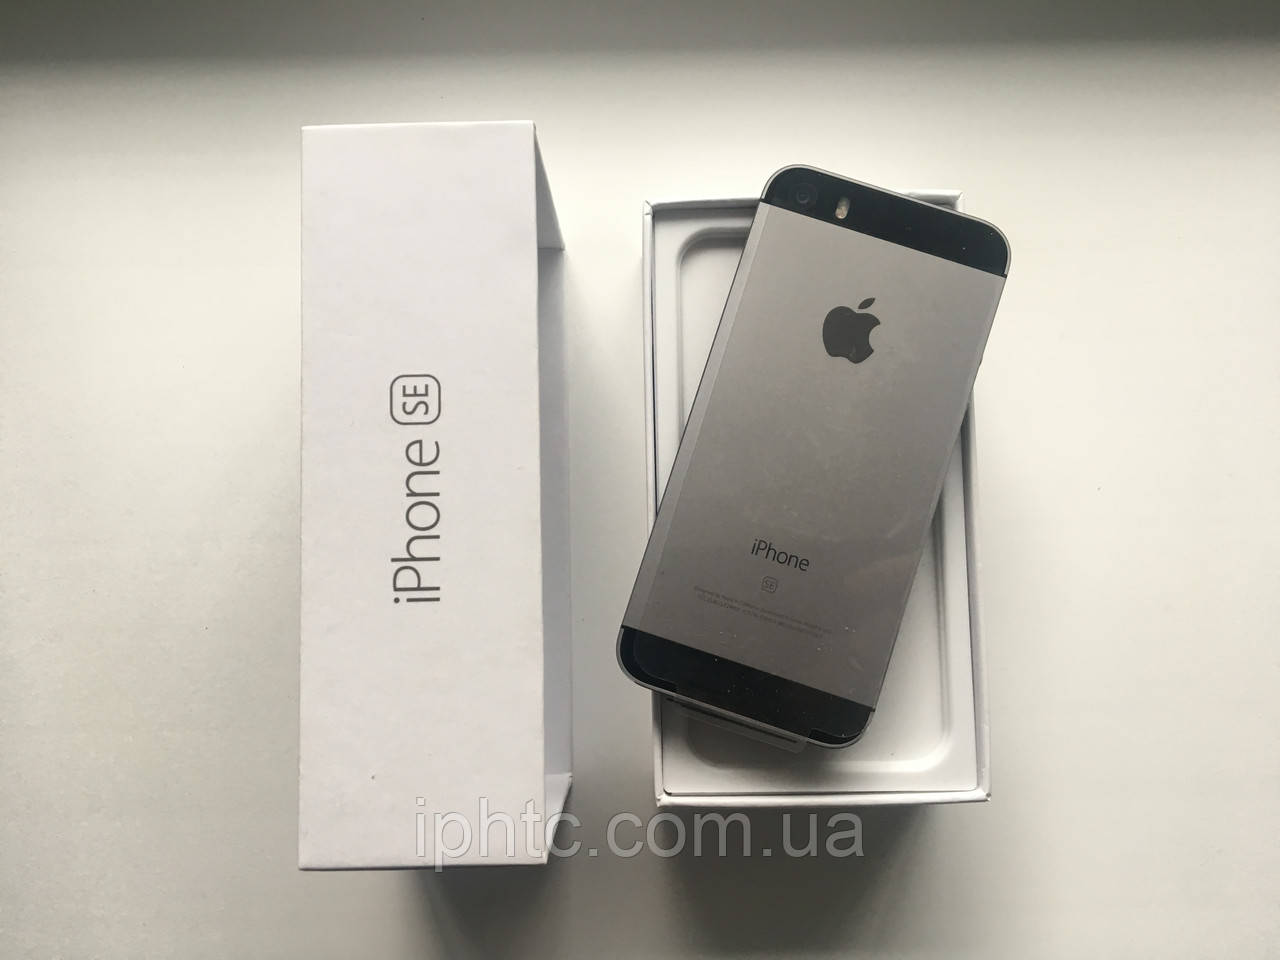 Apple iPhone SE 16GB Grey 4G /Новый / NeverLock